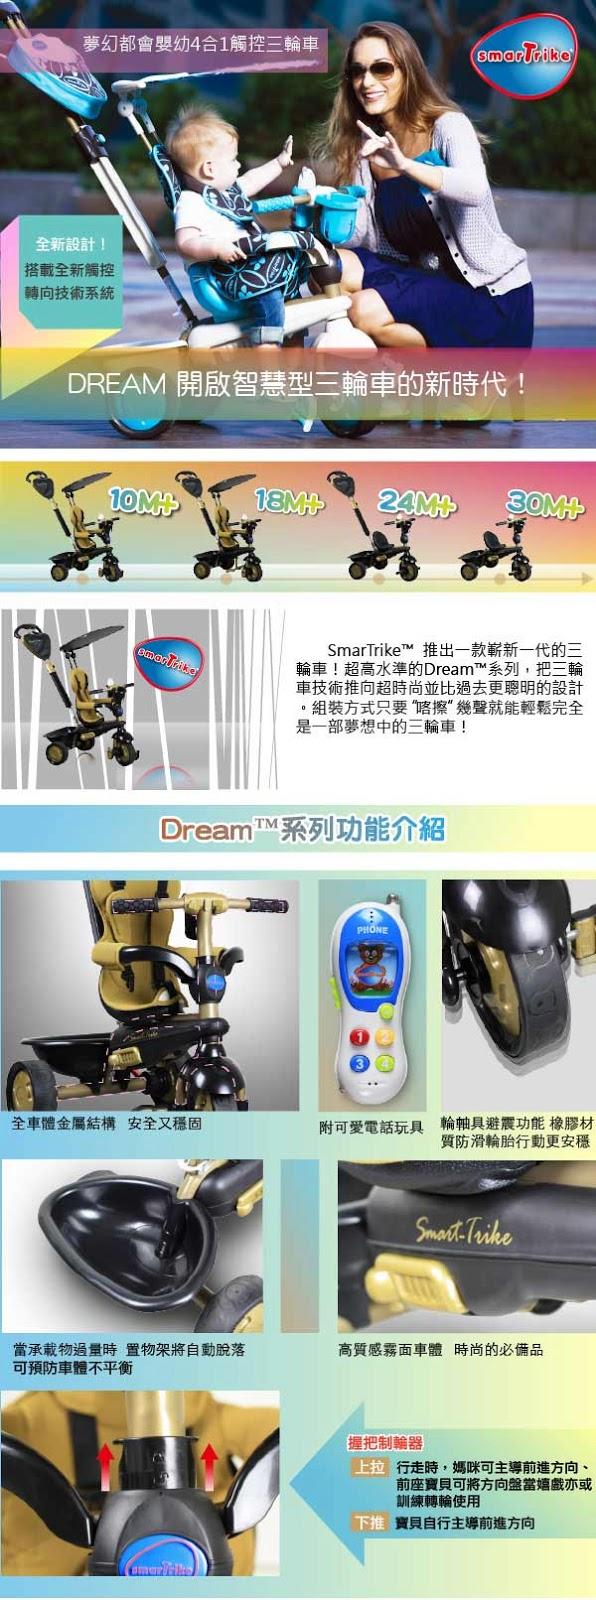 smar-trike Dream 開啟智慧型三輪車的新時代!